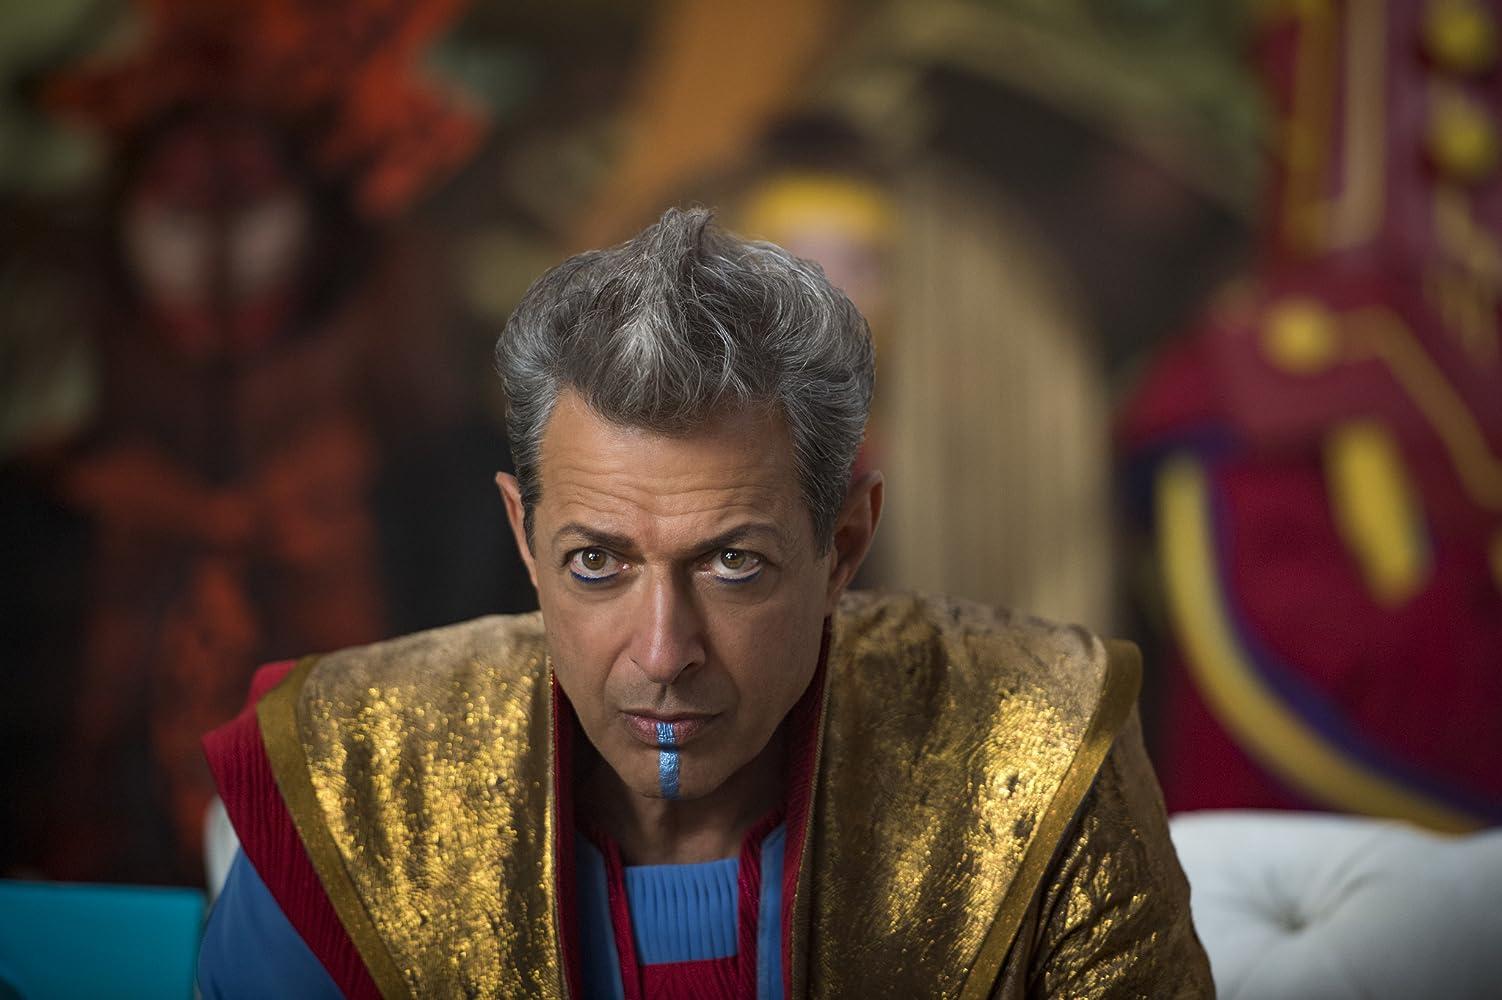 Jeff Goldblum in Thor: Ragnarok (2017)